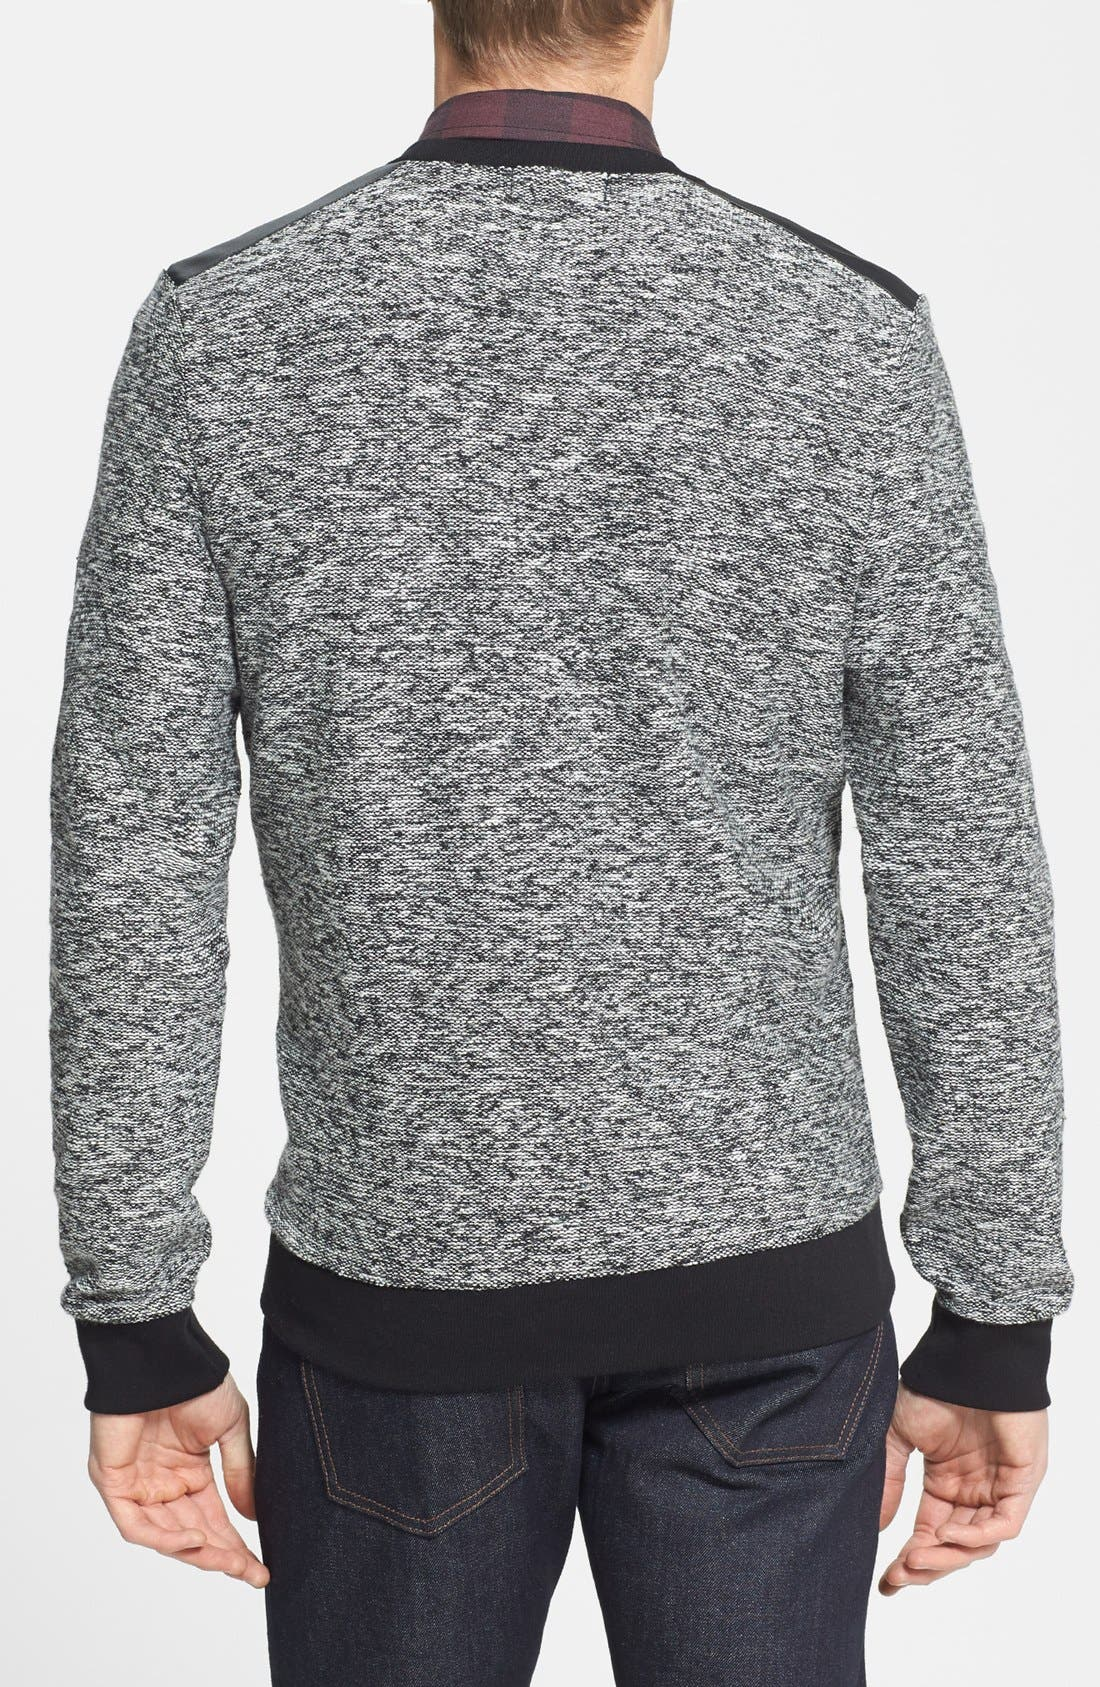 Alternate Image 2  - Topman Crewneck Sweatshirt with Faux Leather Shoulder Trim